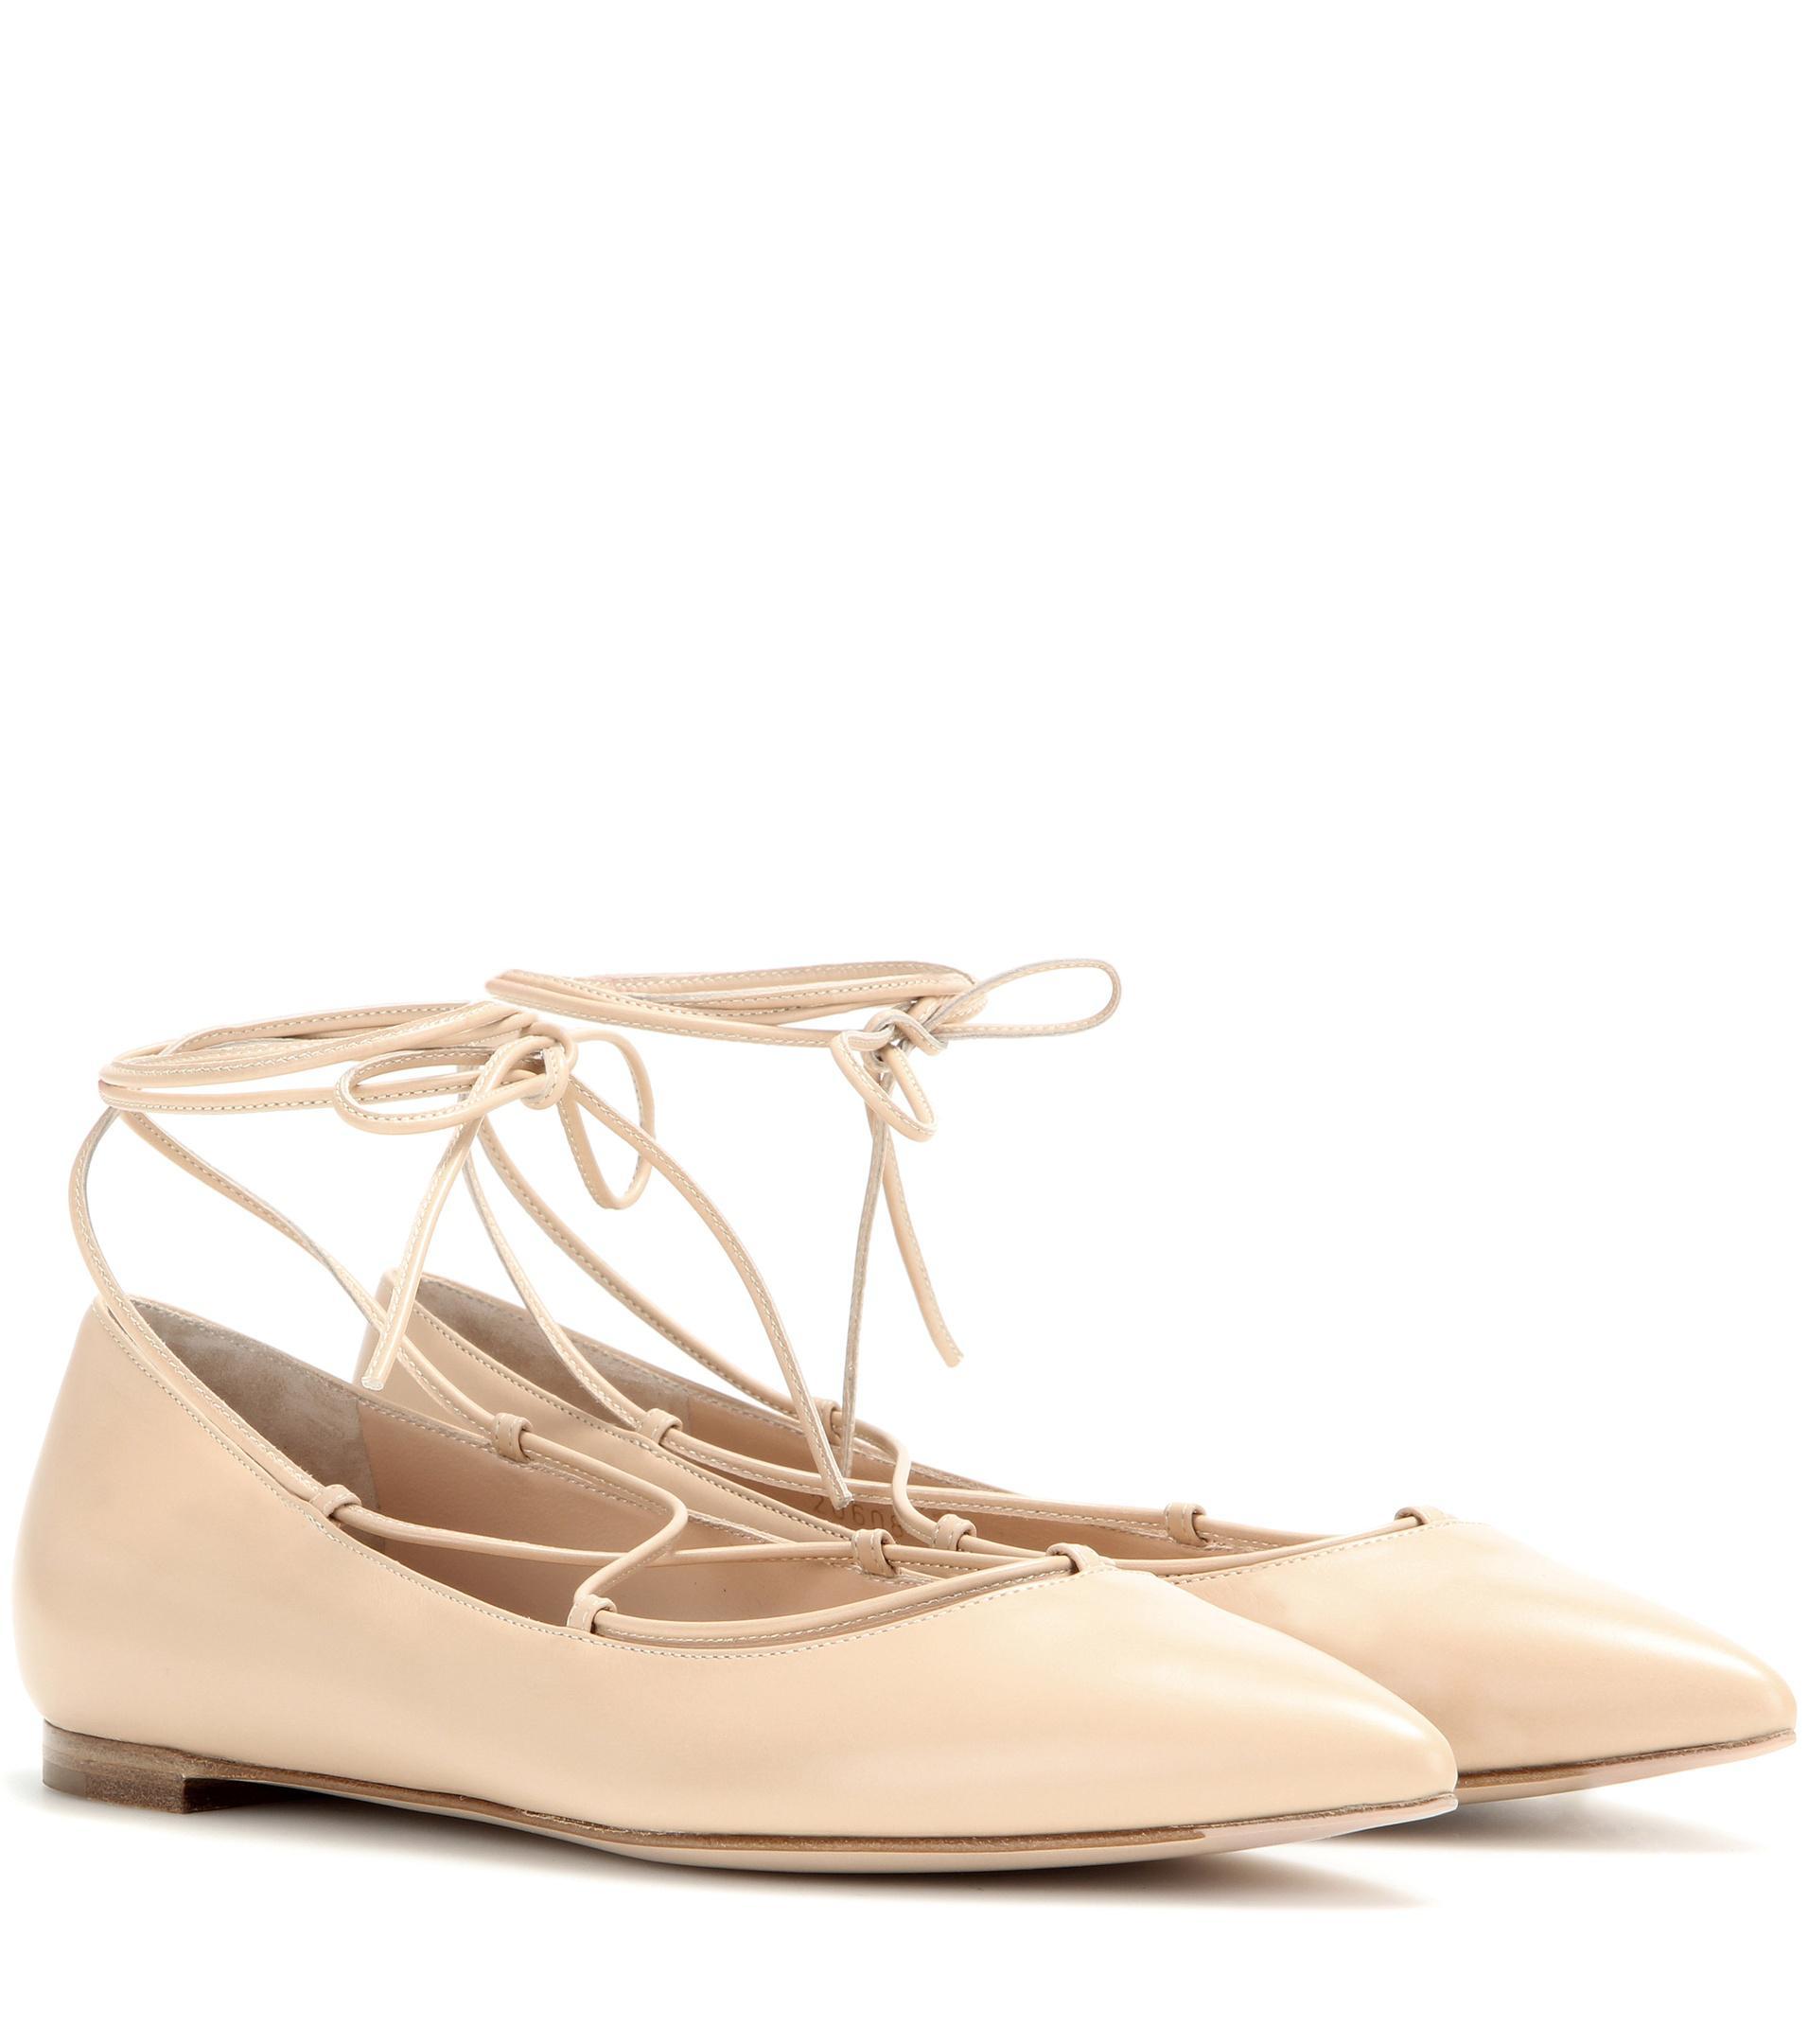 Gianvito Rossi Leather ballerinas Nicekicks Cheap Price NURMhr3LB